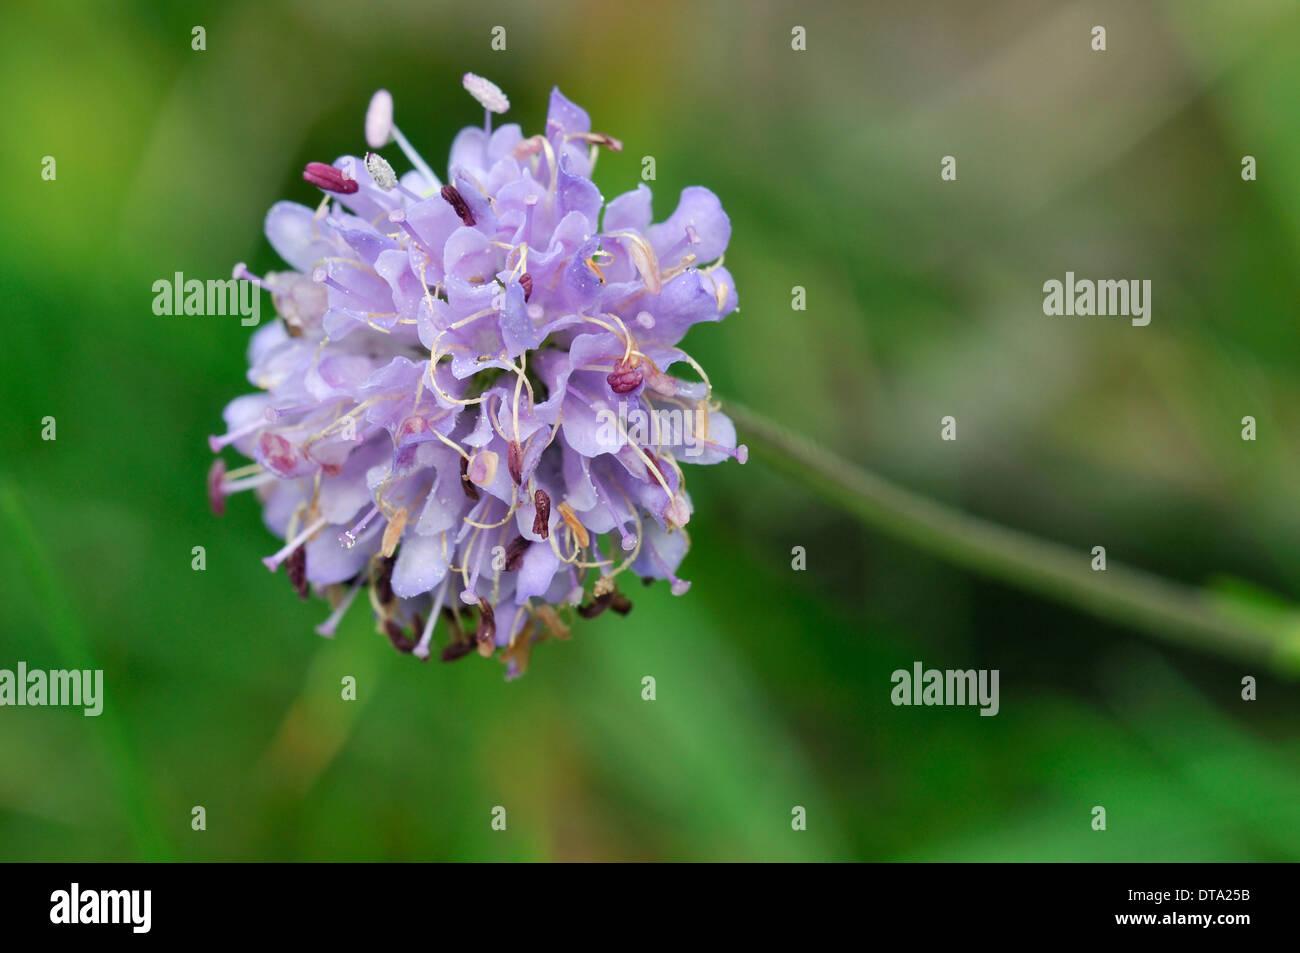 Devils-bit Scabious - Succisa pratensis - Stock Image